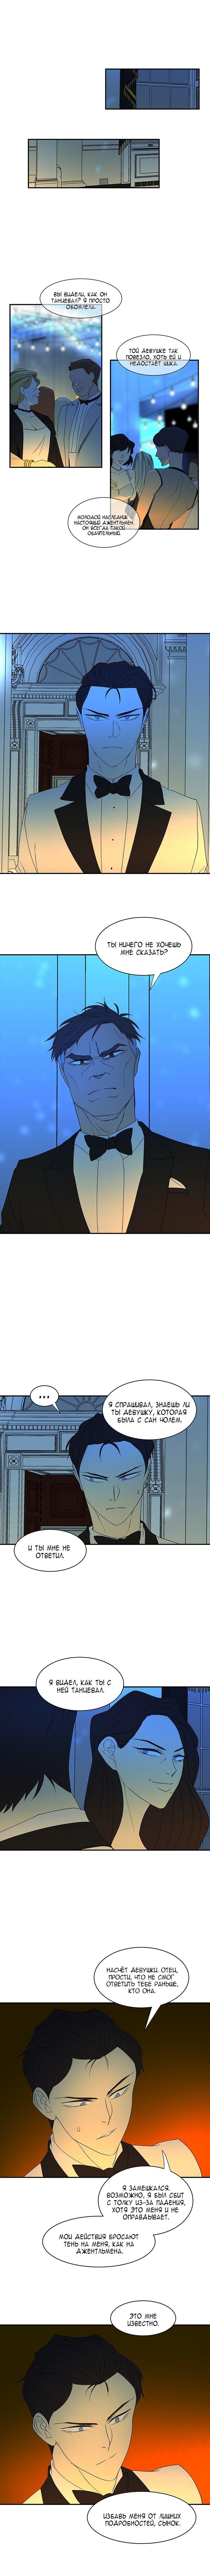 Манга Я люблю Ю / I love Yoo  - Том 1 Глава 56 Страница 1